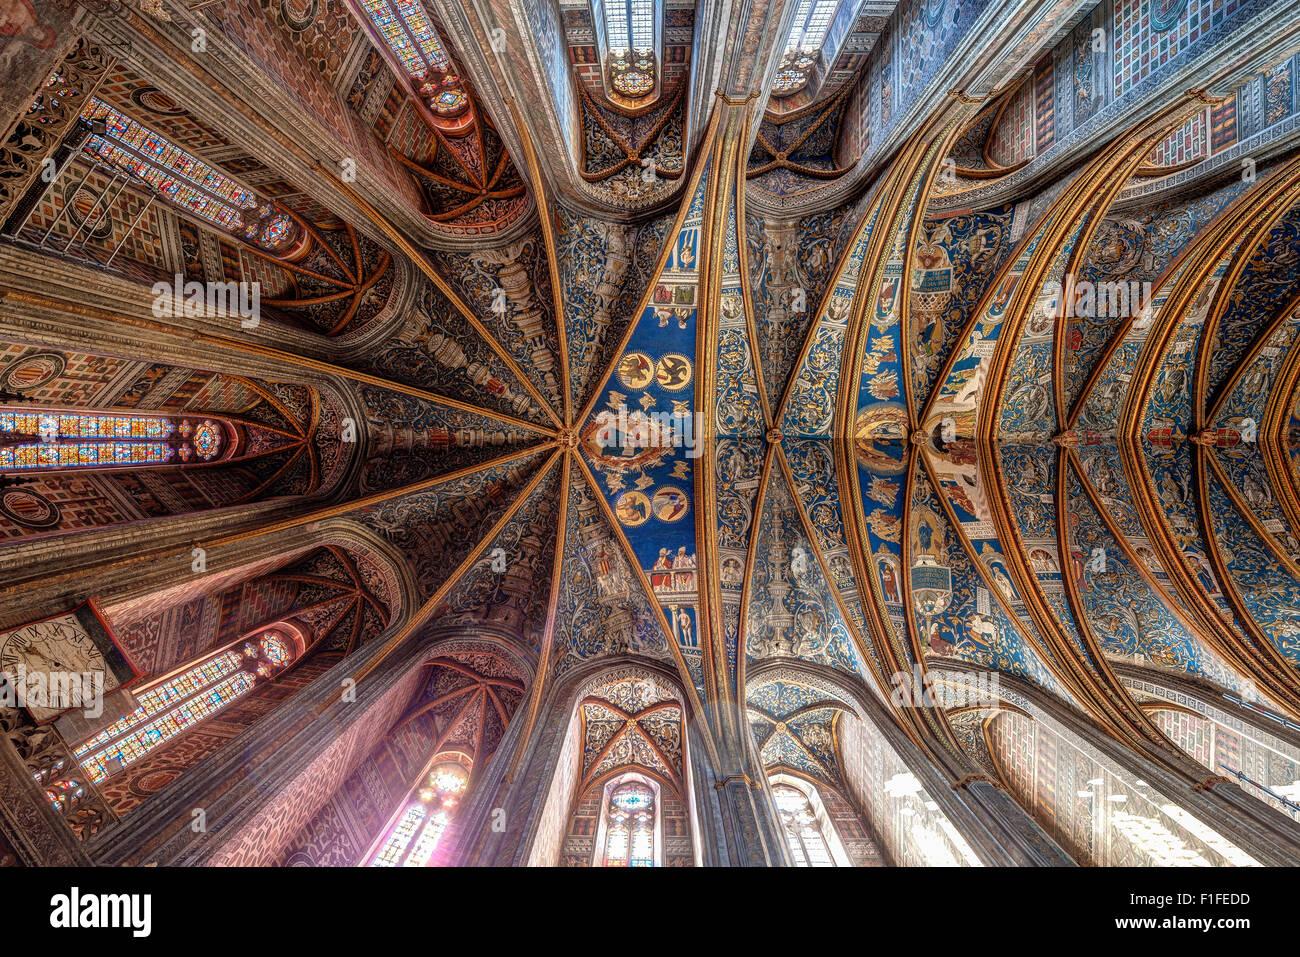 Albi Kathedralendecke mit Fresken. Kathedrale Basilica von Sankt Cecilia Basilika Cathédrale Sainte-Cécile Stockbild